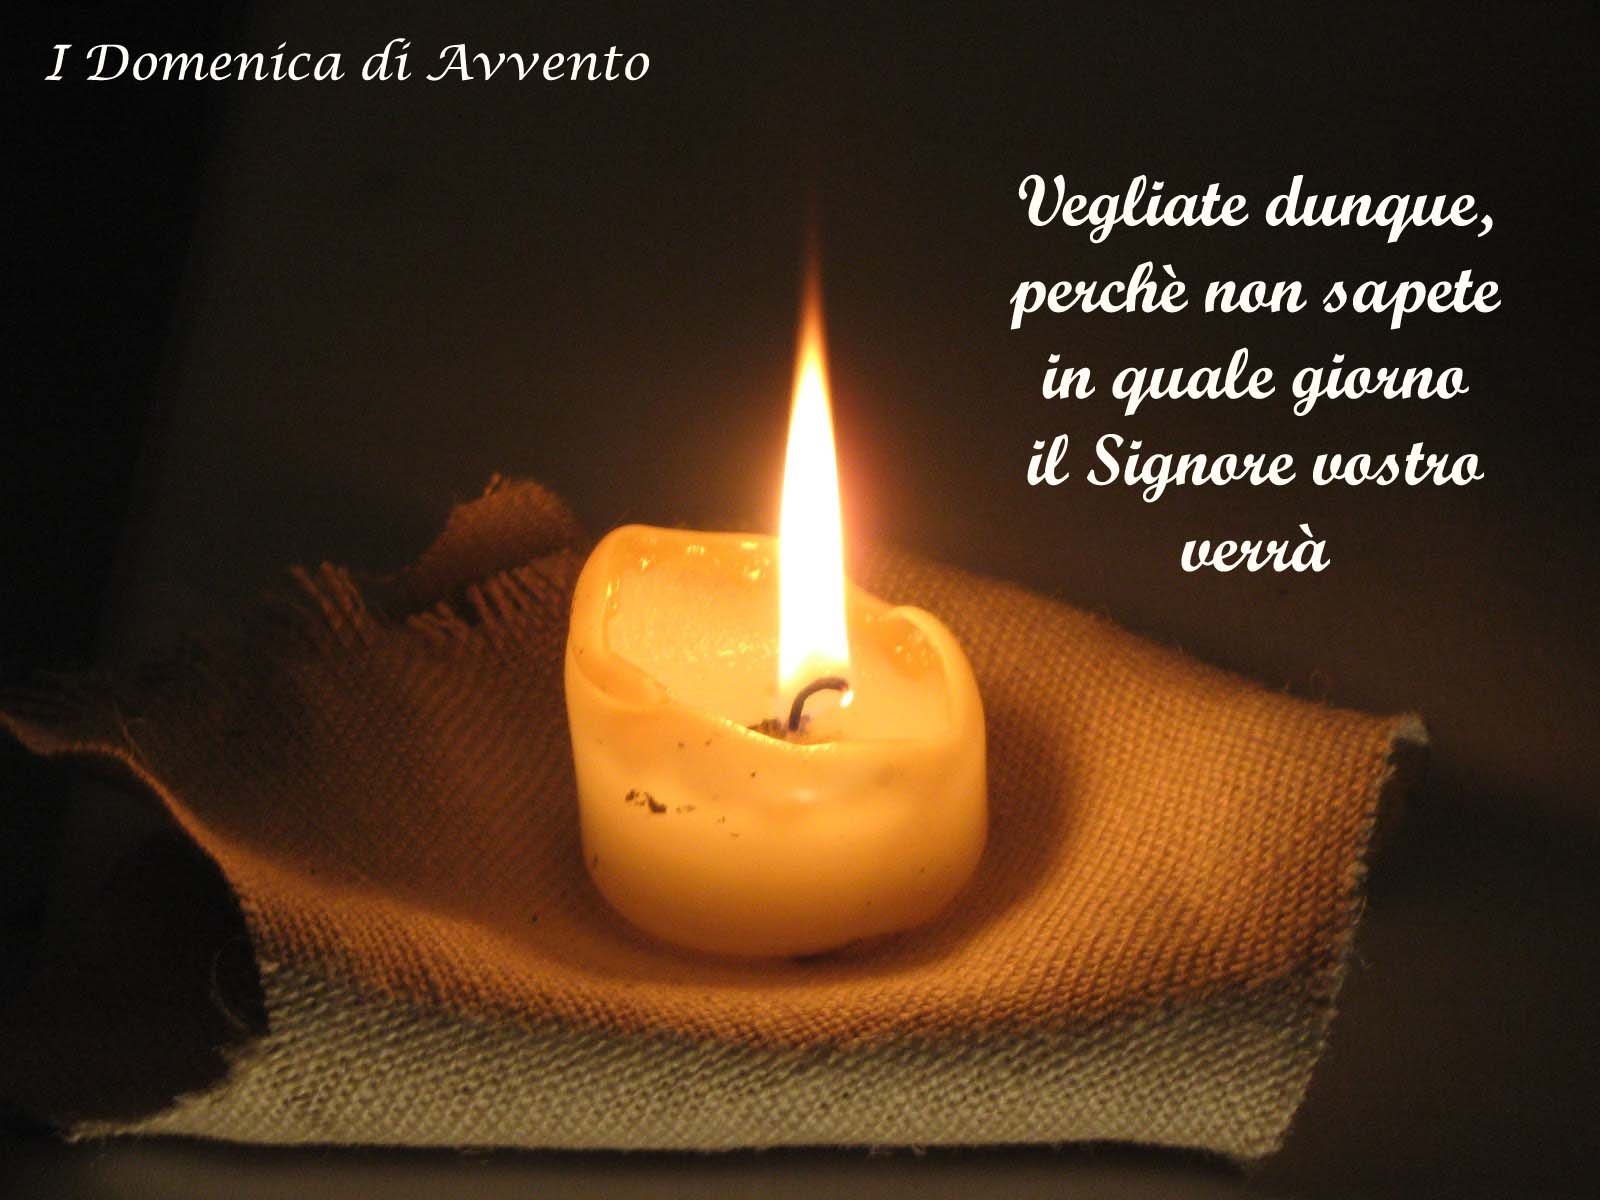 http://www.arcidiocesi.vc.it/wp-content/uploads/2014/11/1-avv.jpg